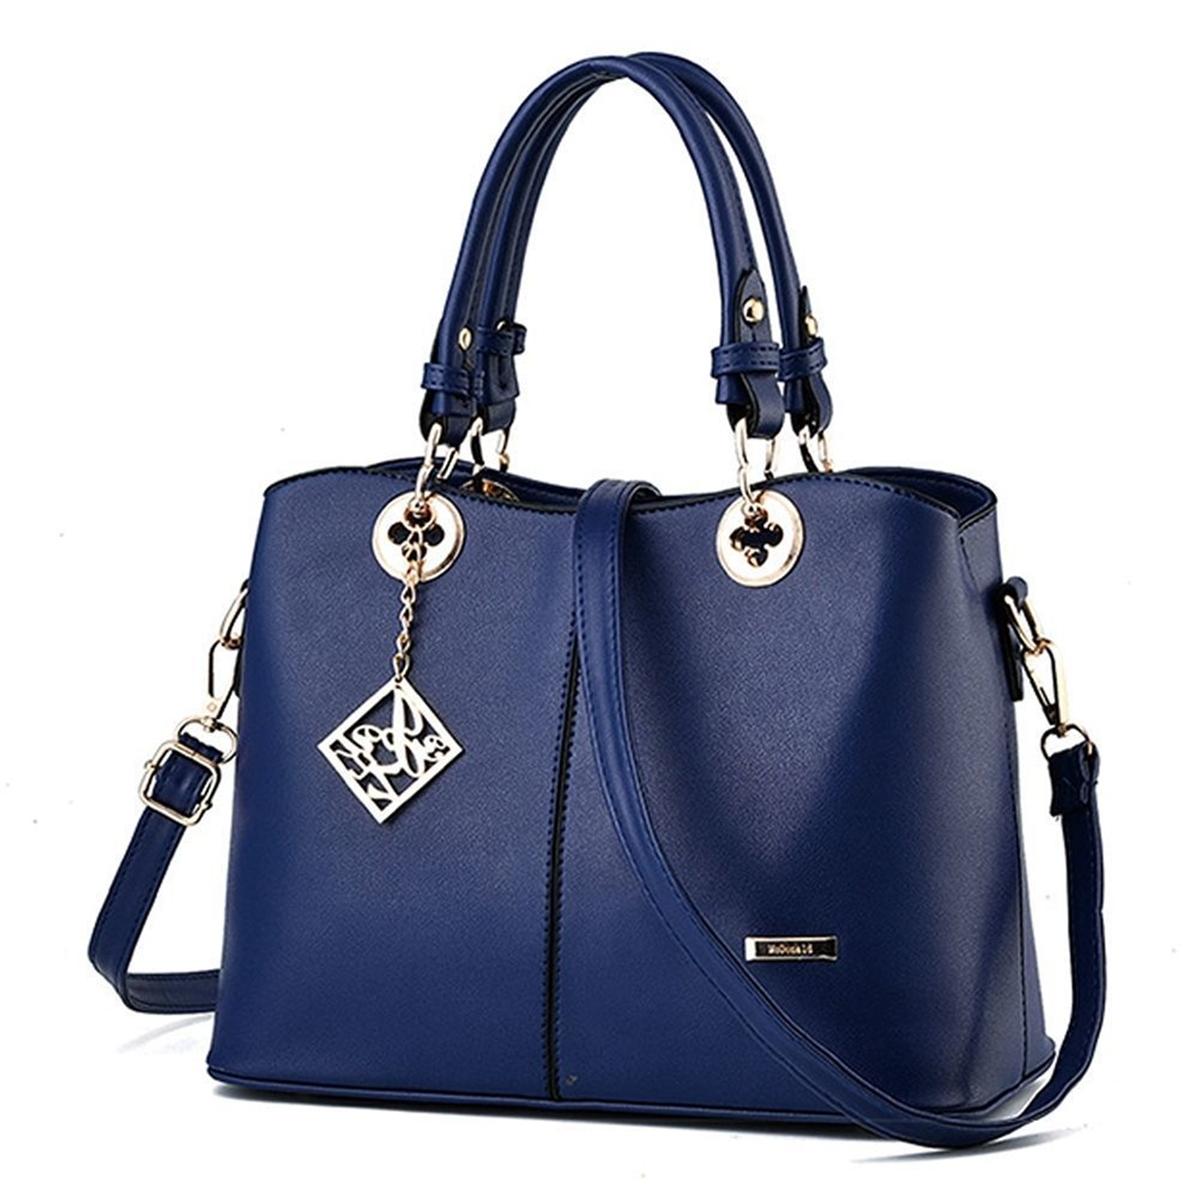 Women-Leather-Handbag-Shoulder-Messenger-Lady-Satchel-Tote-Crossbody-Bags-Purse